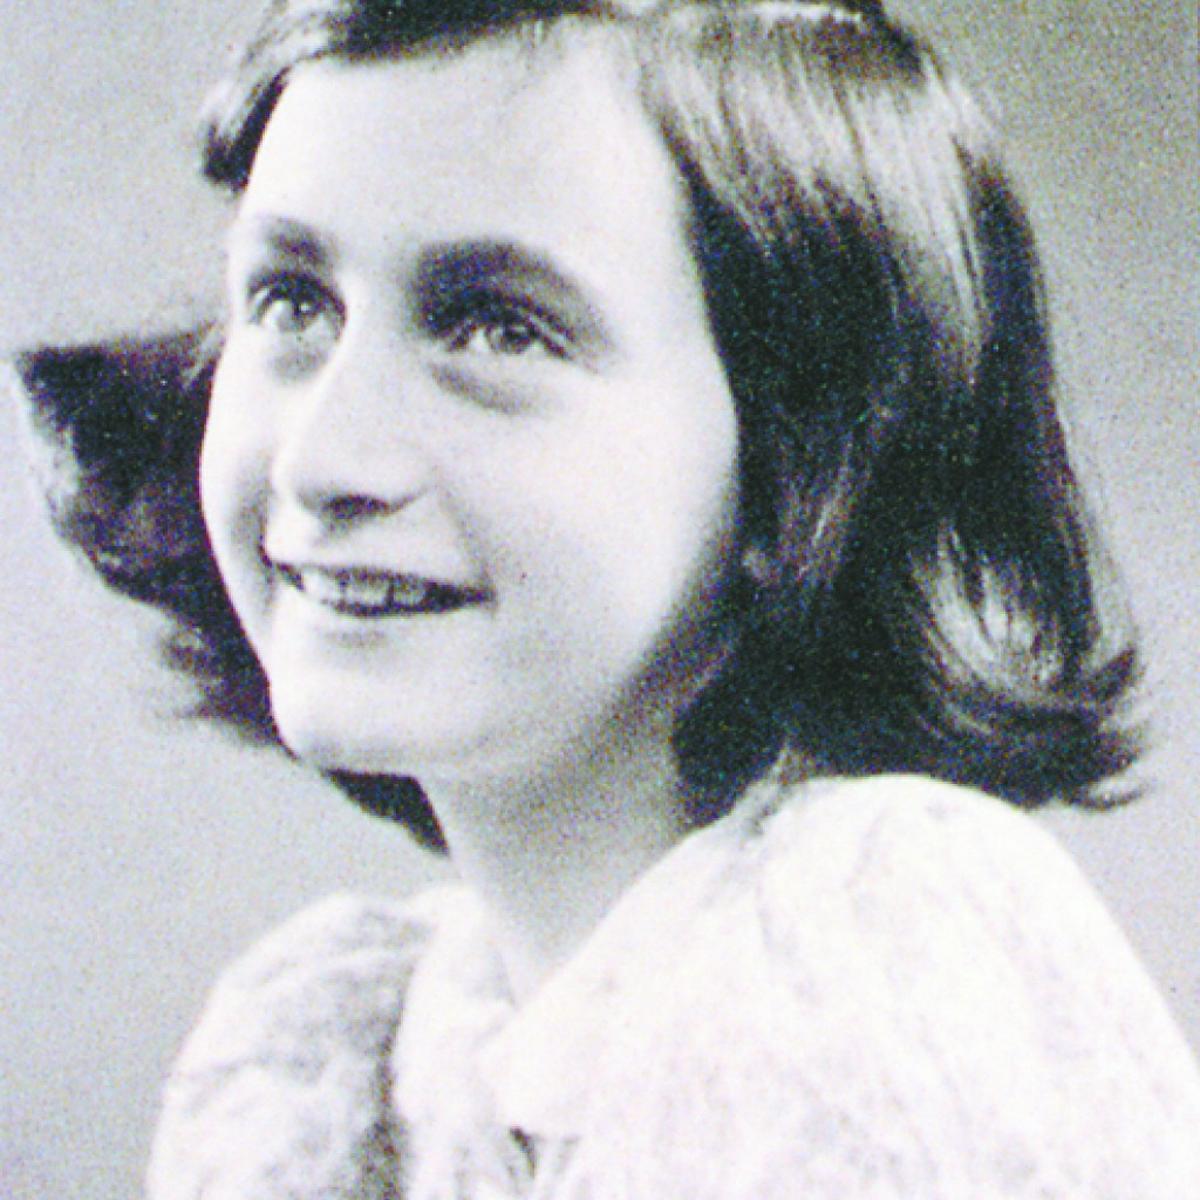 Anne Frank's Iowa pen pal tells her story   Local News